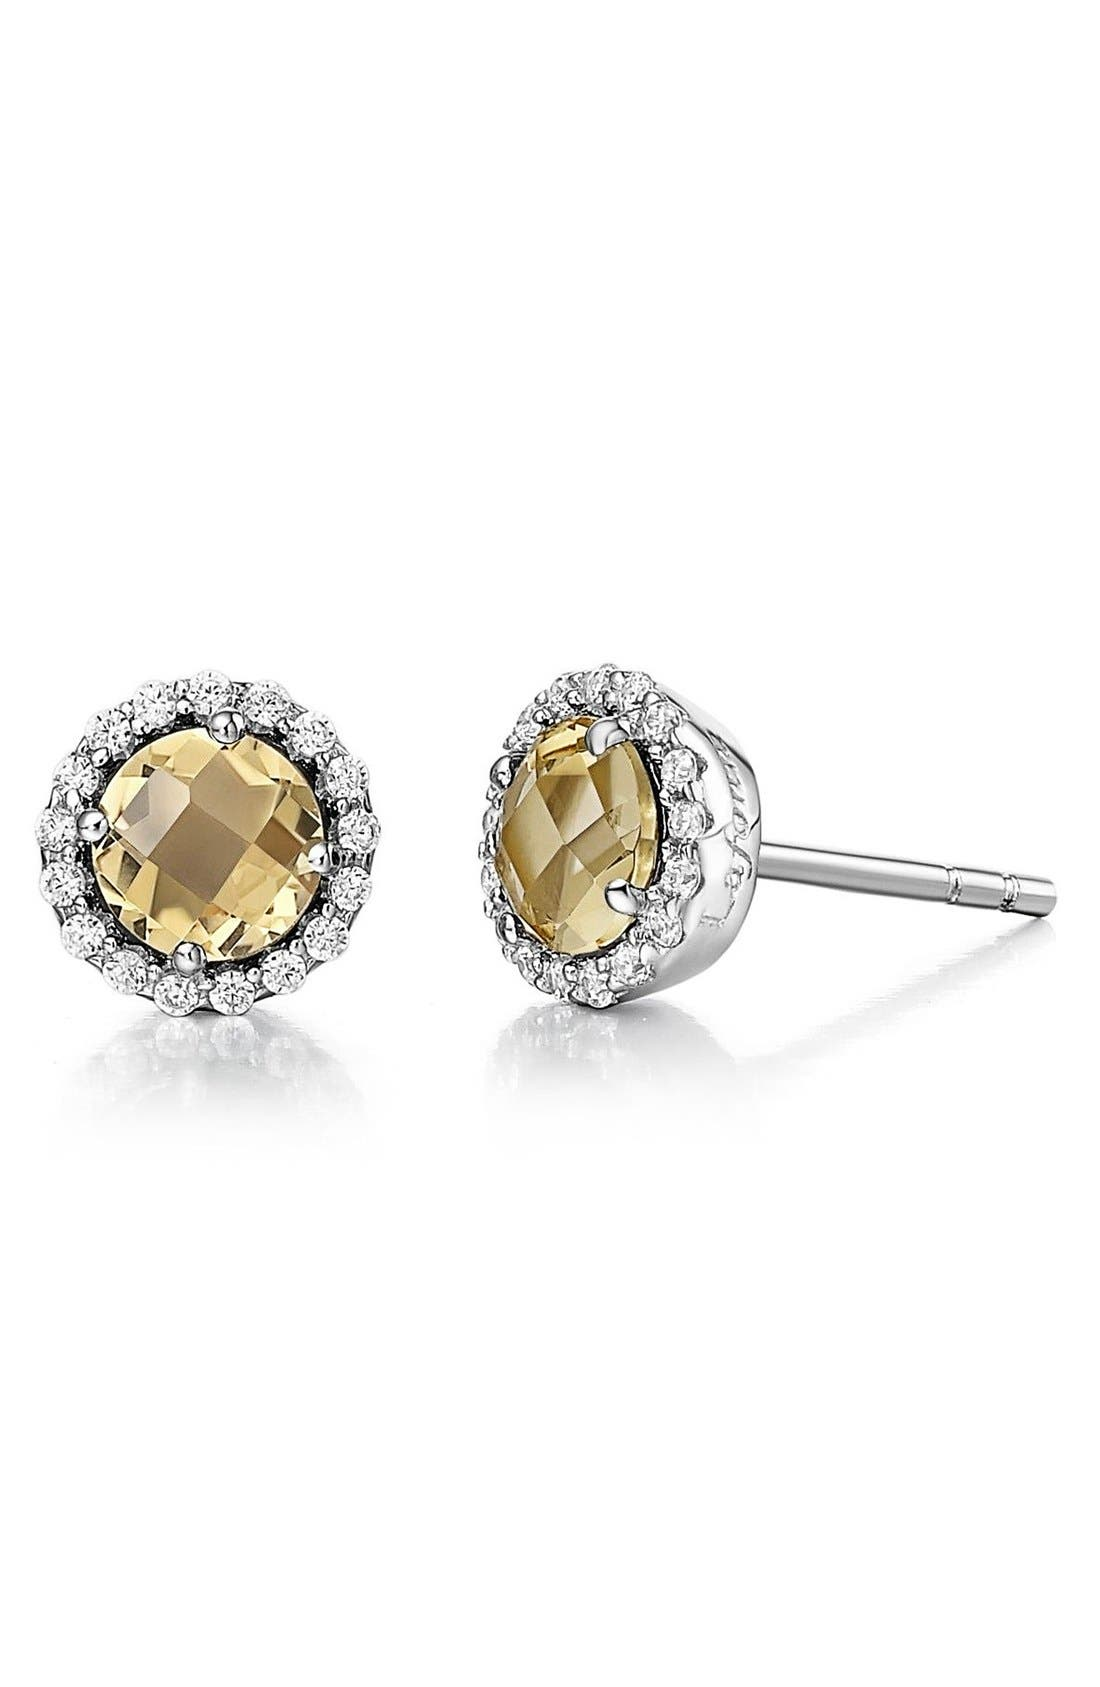 Birthstone Stud Earrings,                         Main,                         color, November Citrine / Silver